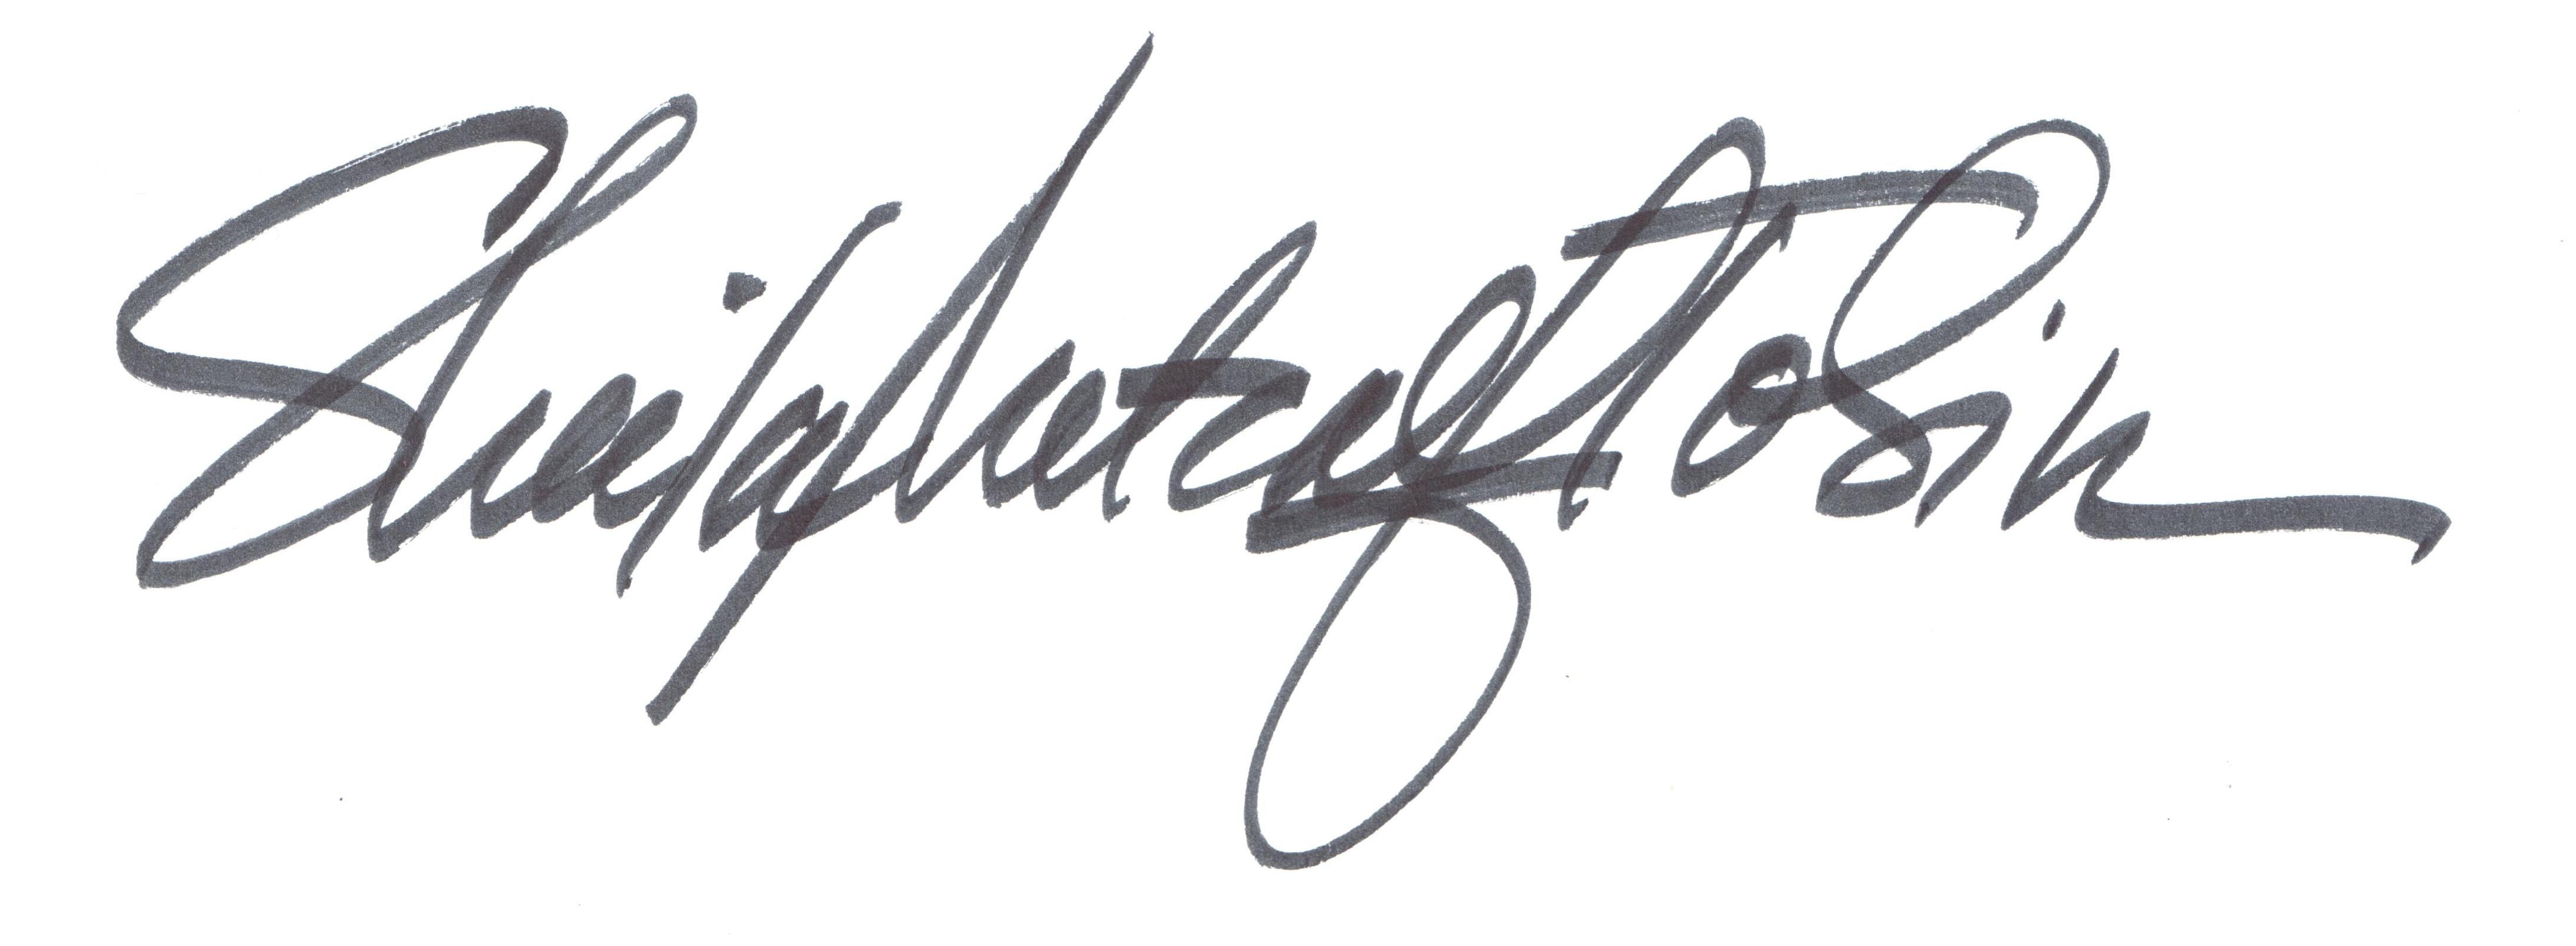 sheila metcalf tobin's Signature